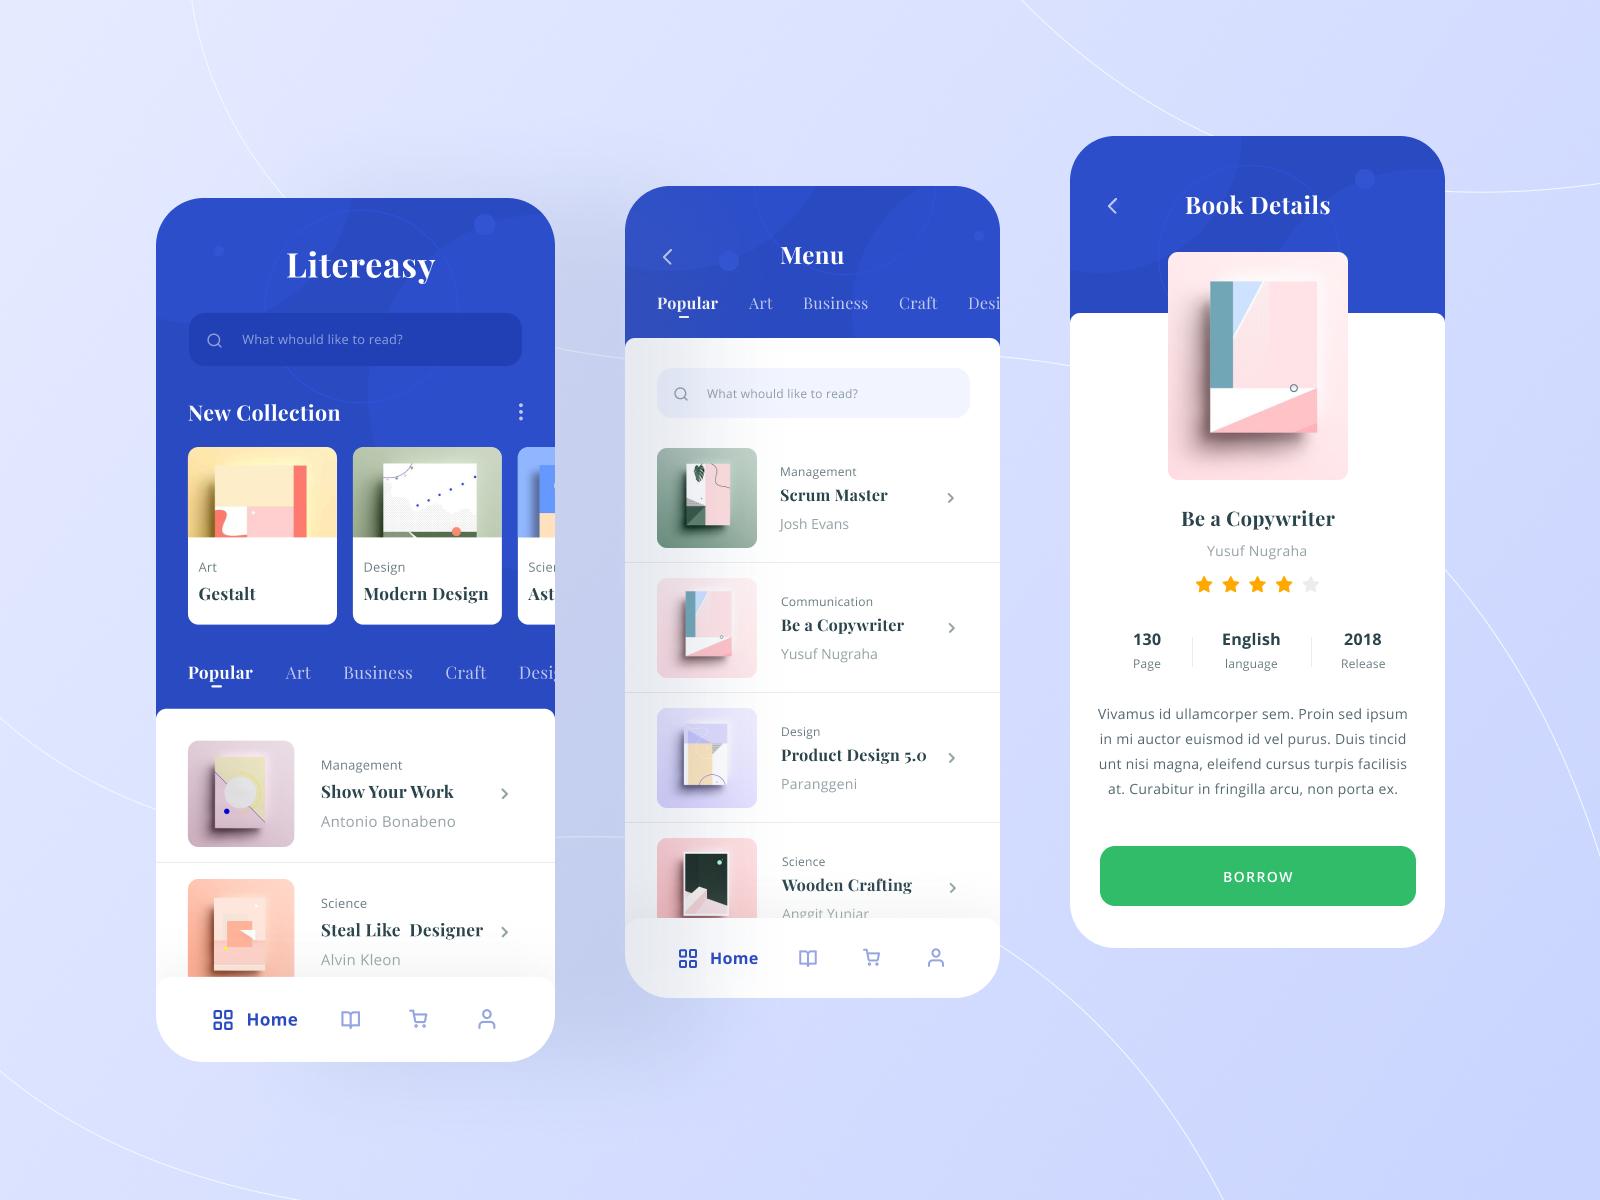 Litereasy Digital Library App